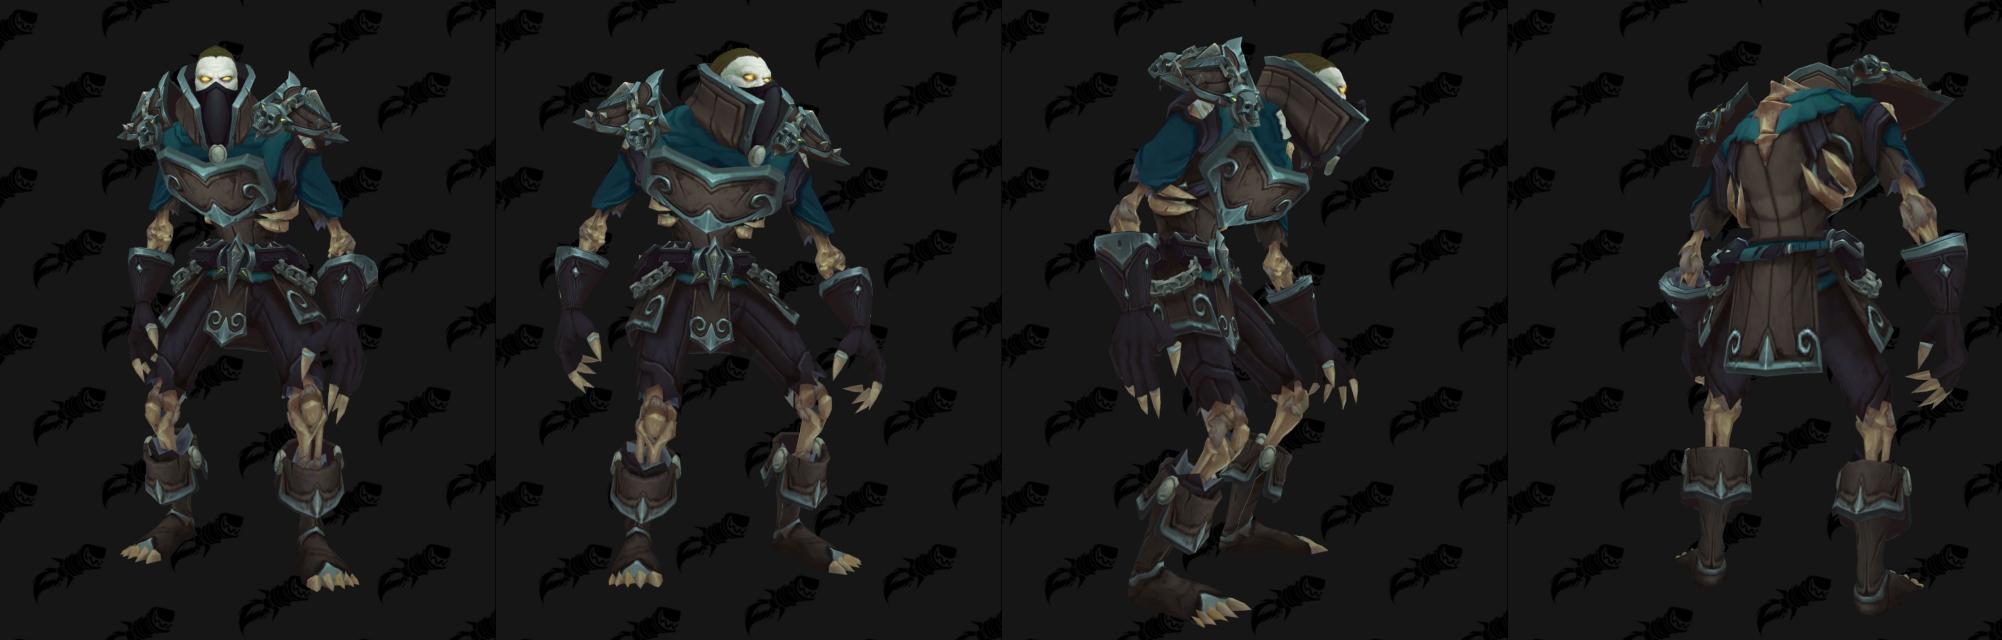 Armure Cuir Horde - Front de guerre Sombrivage Tier 1